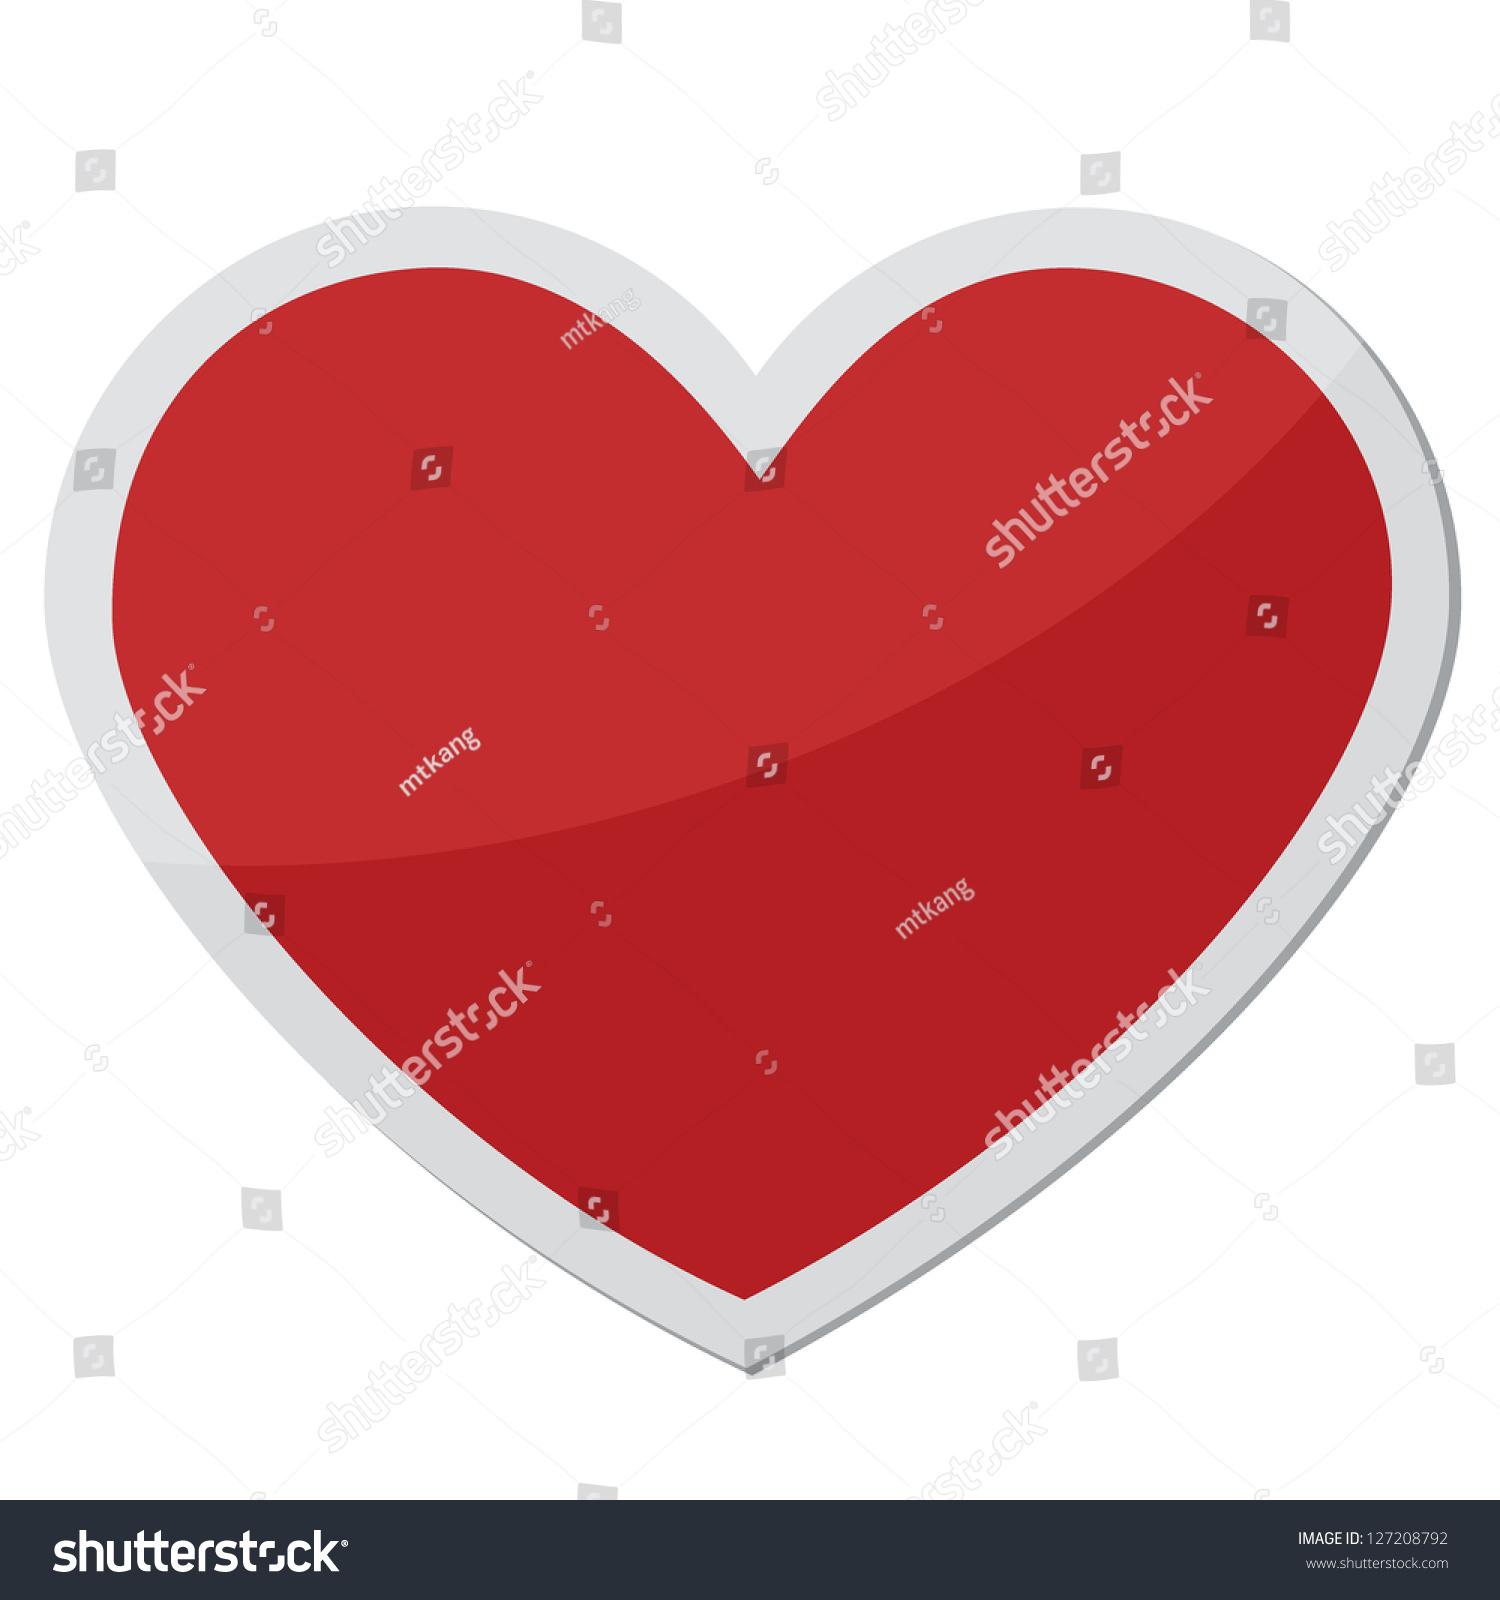 Heart shape design love symbols stock vector 127208792 shutterstock heart shape design for love symbols buycottarizona Gallery